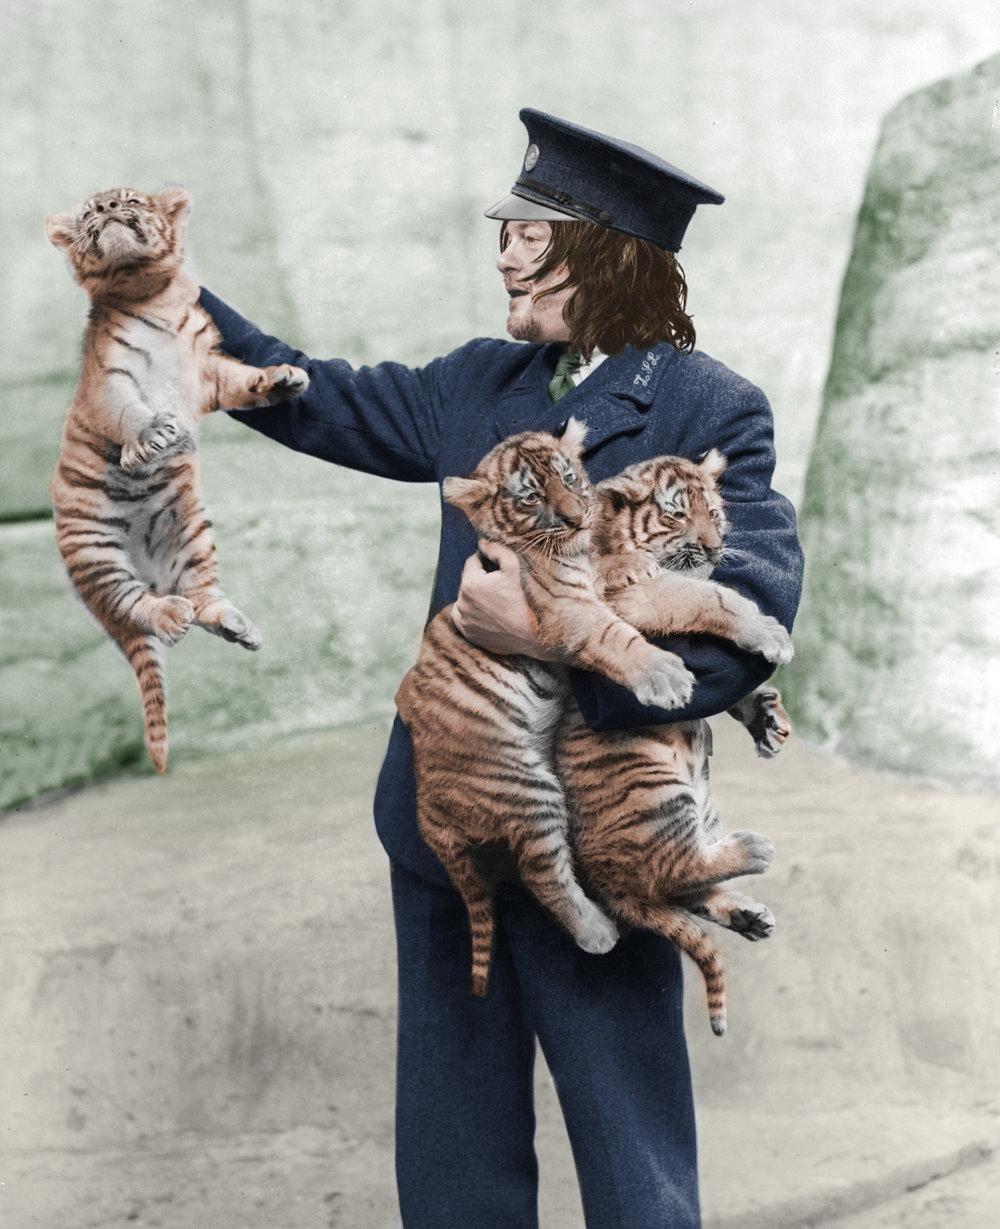 str-man-with-tiger-cubs-BLUE.jpg